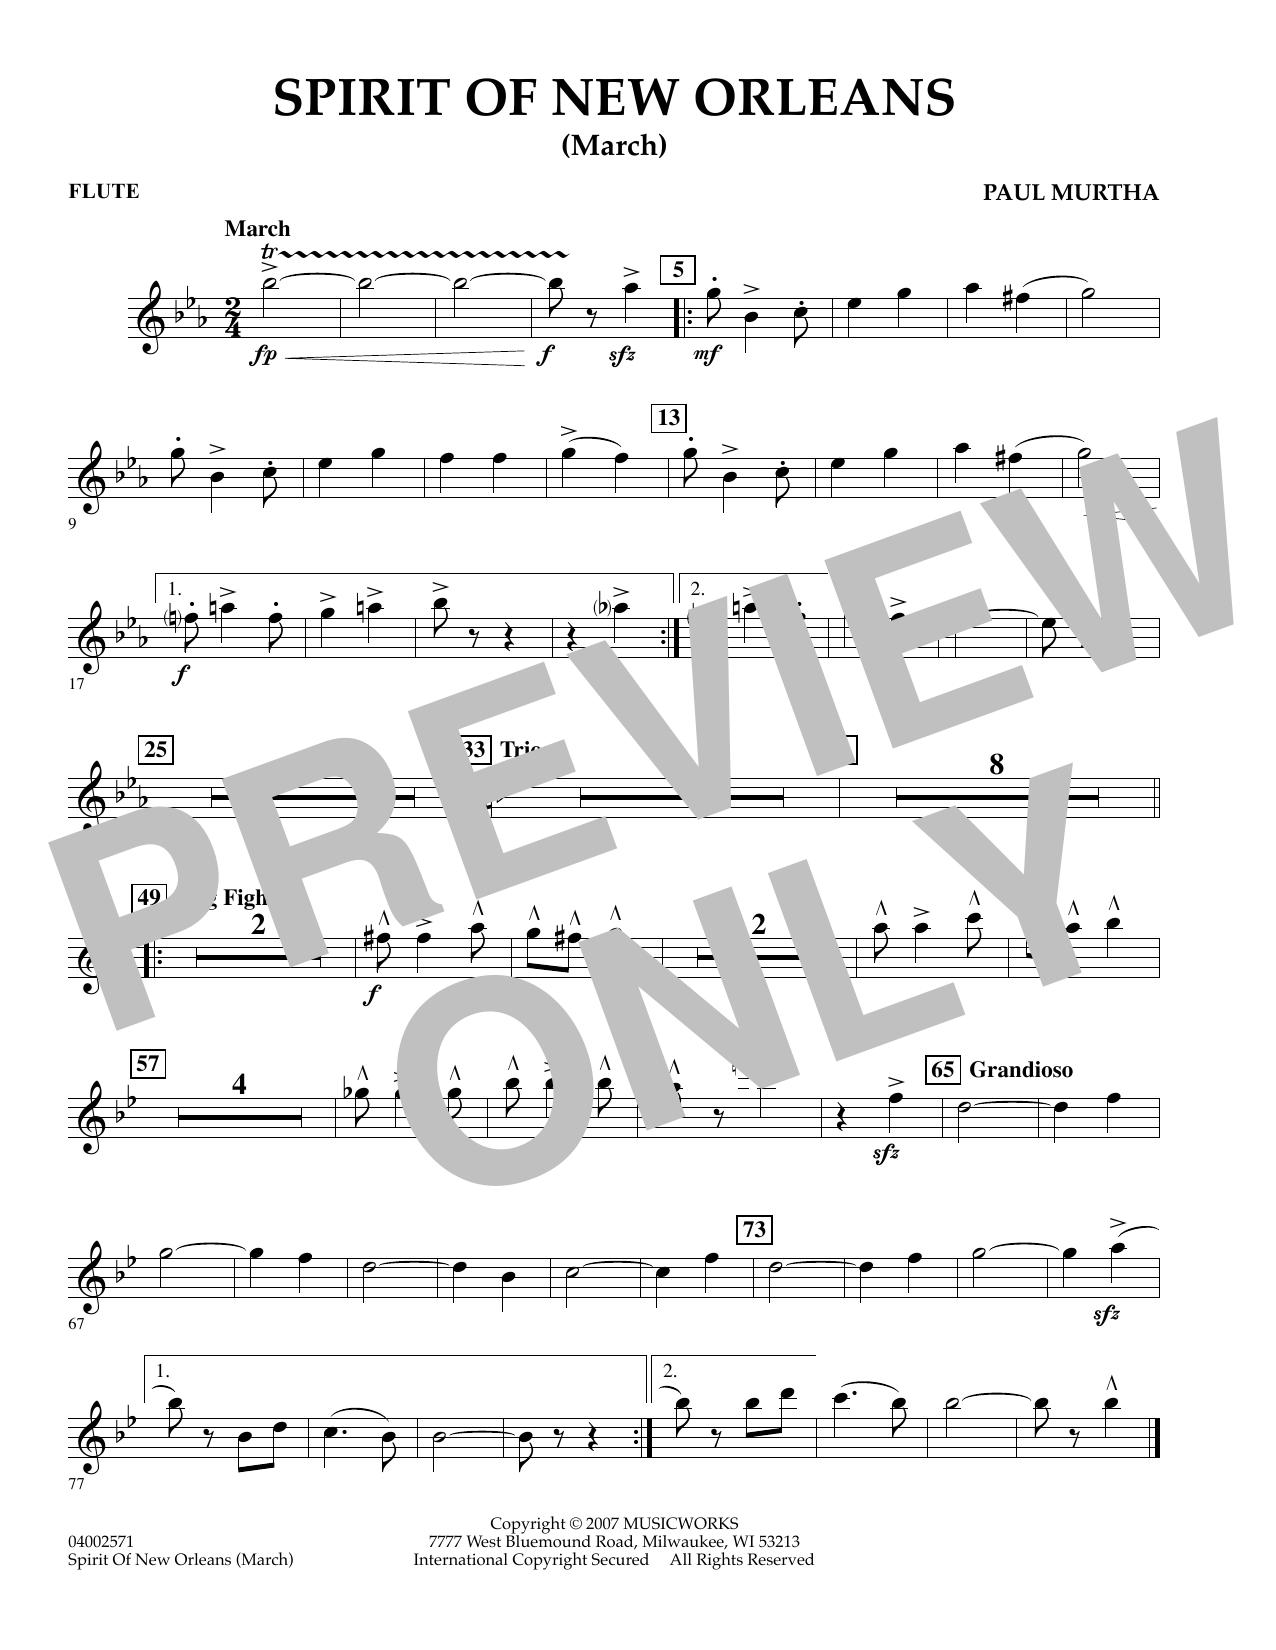 Spirit Of New Orleans (March) - Flute sheet music